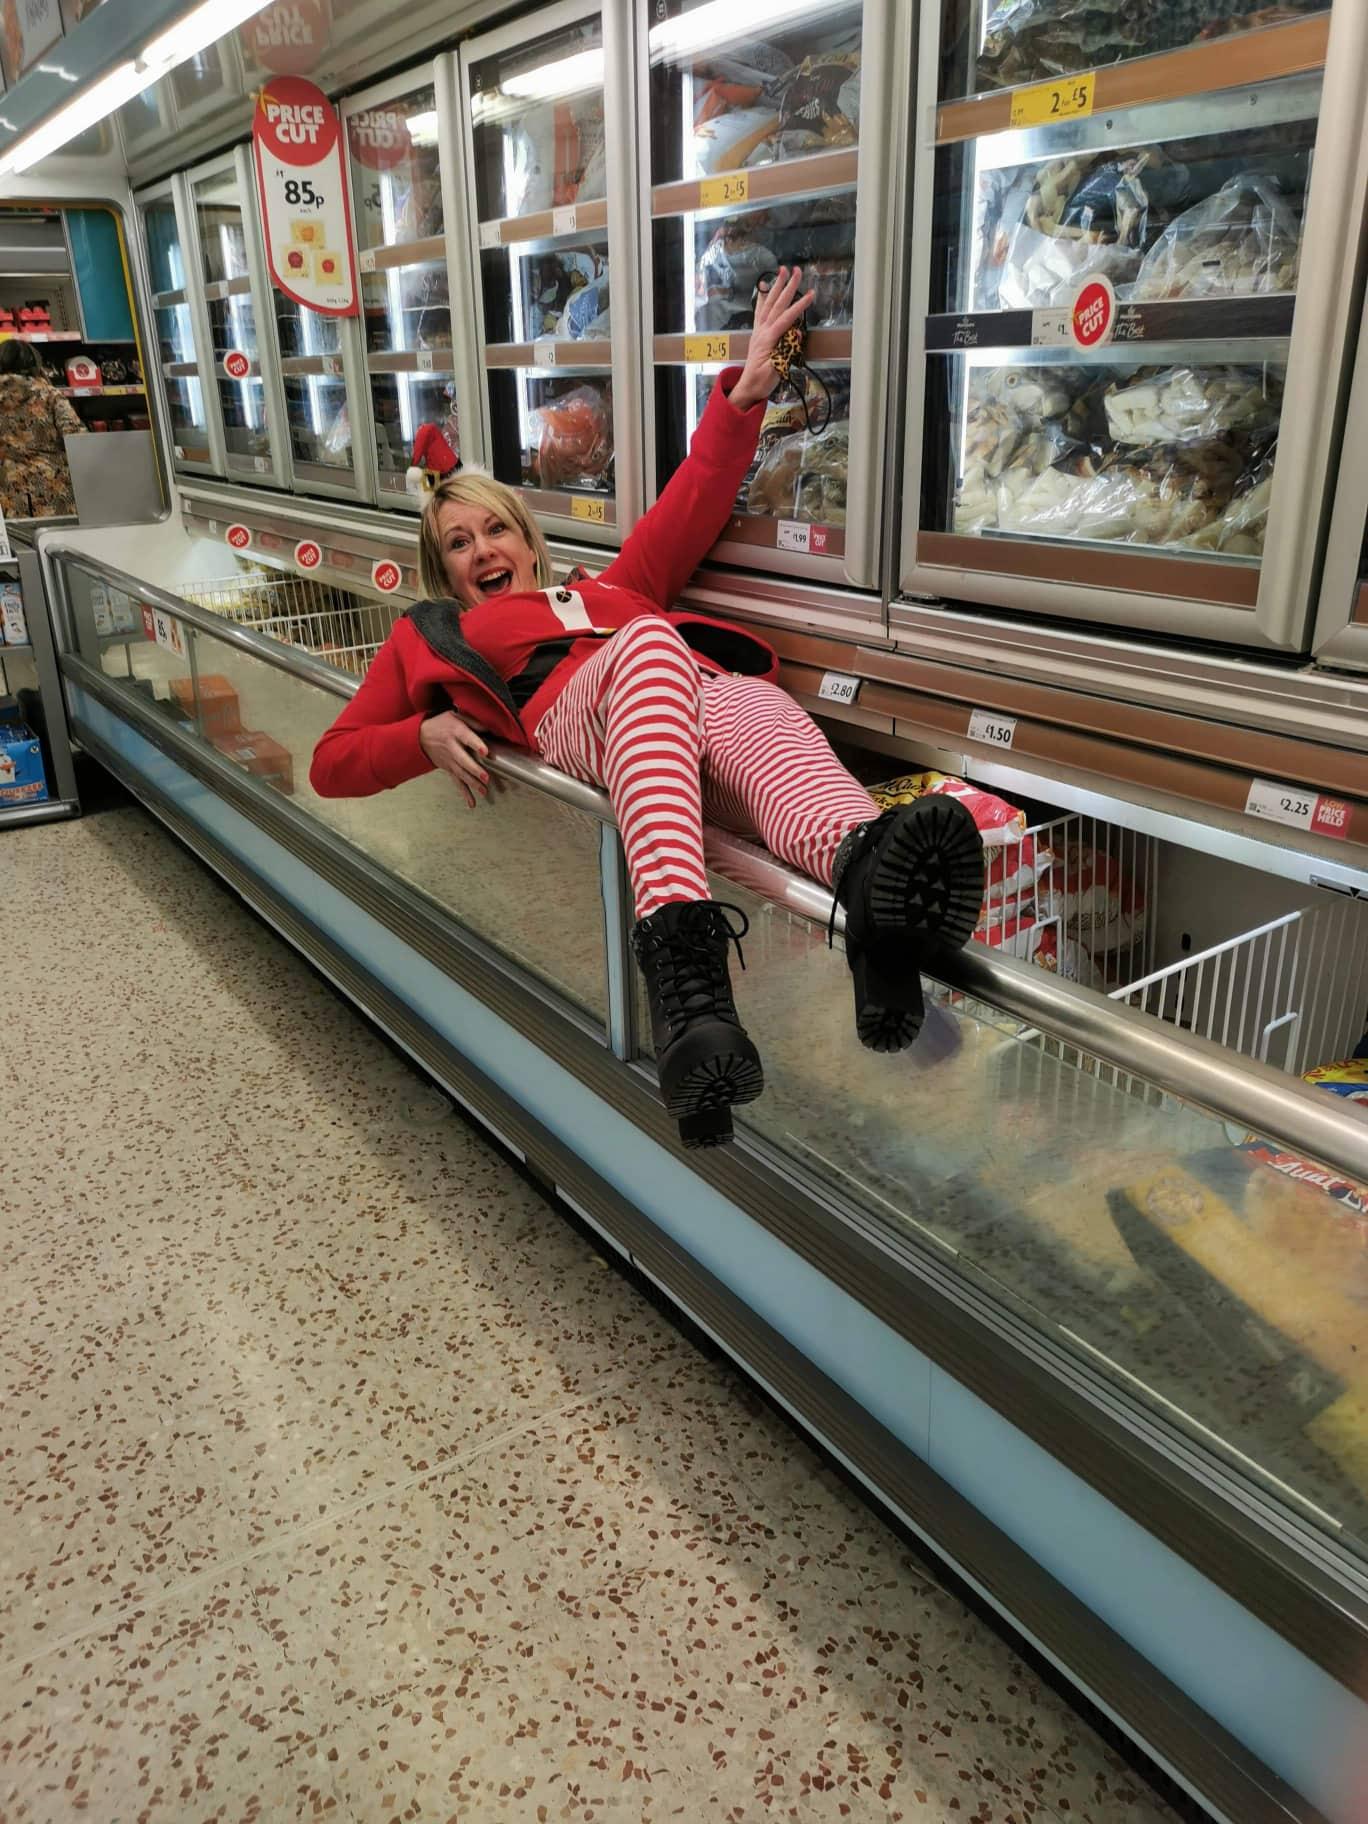 Lady in elf costume lying in supermarket freezer